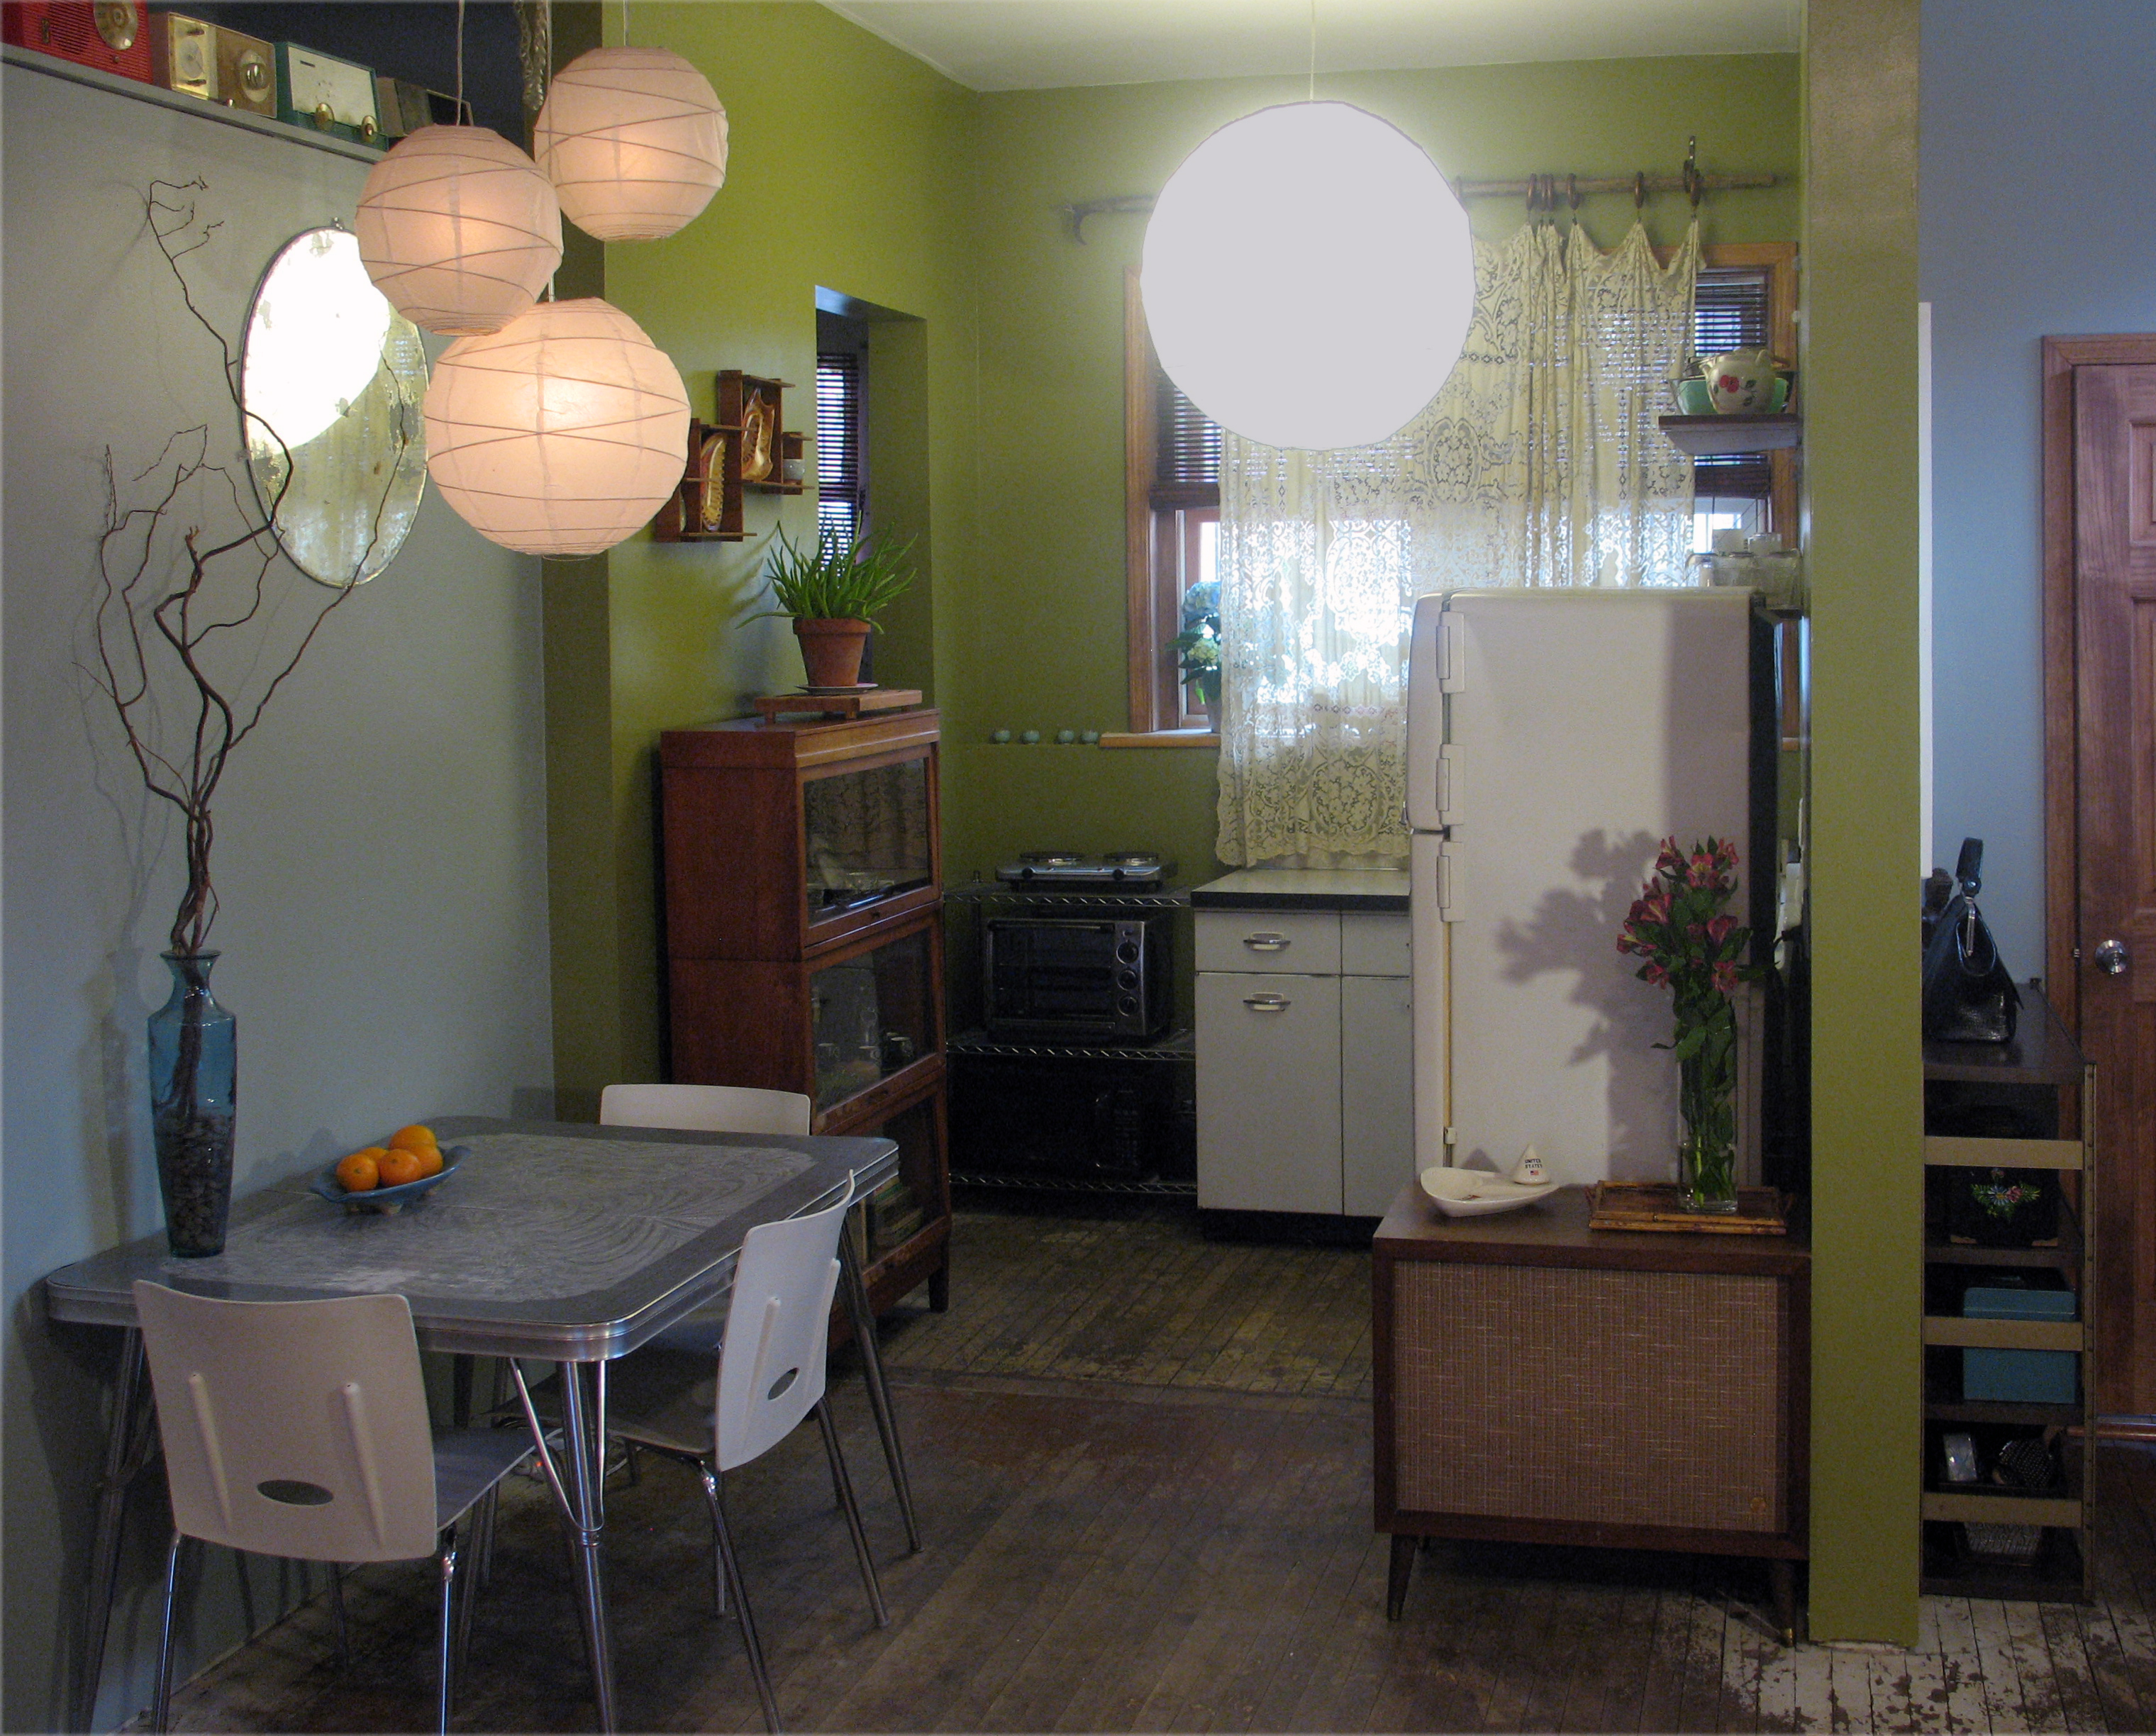 4-12-2009-009-Dining-Room-Kitchen